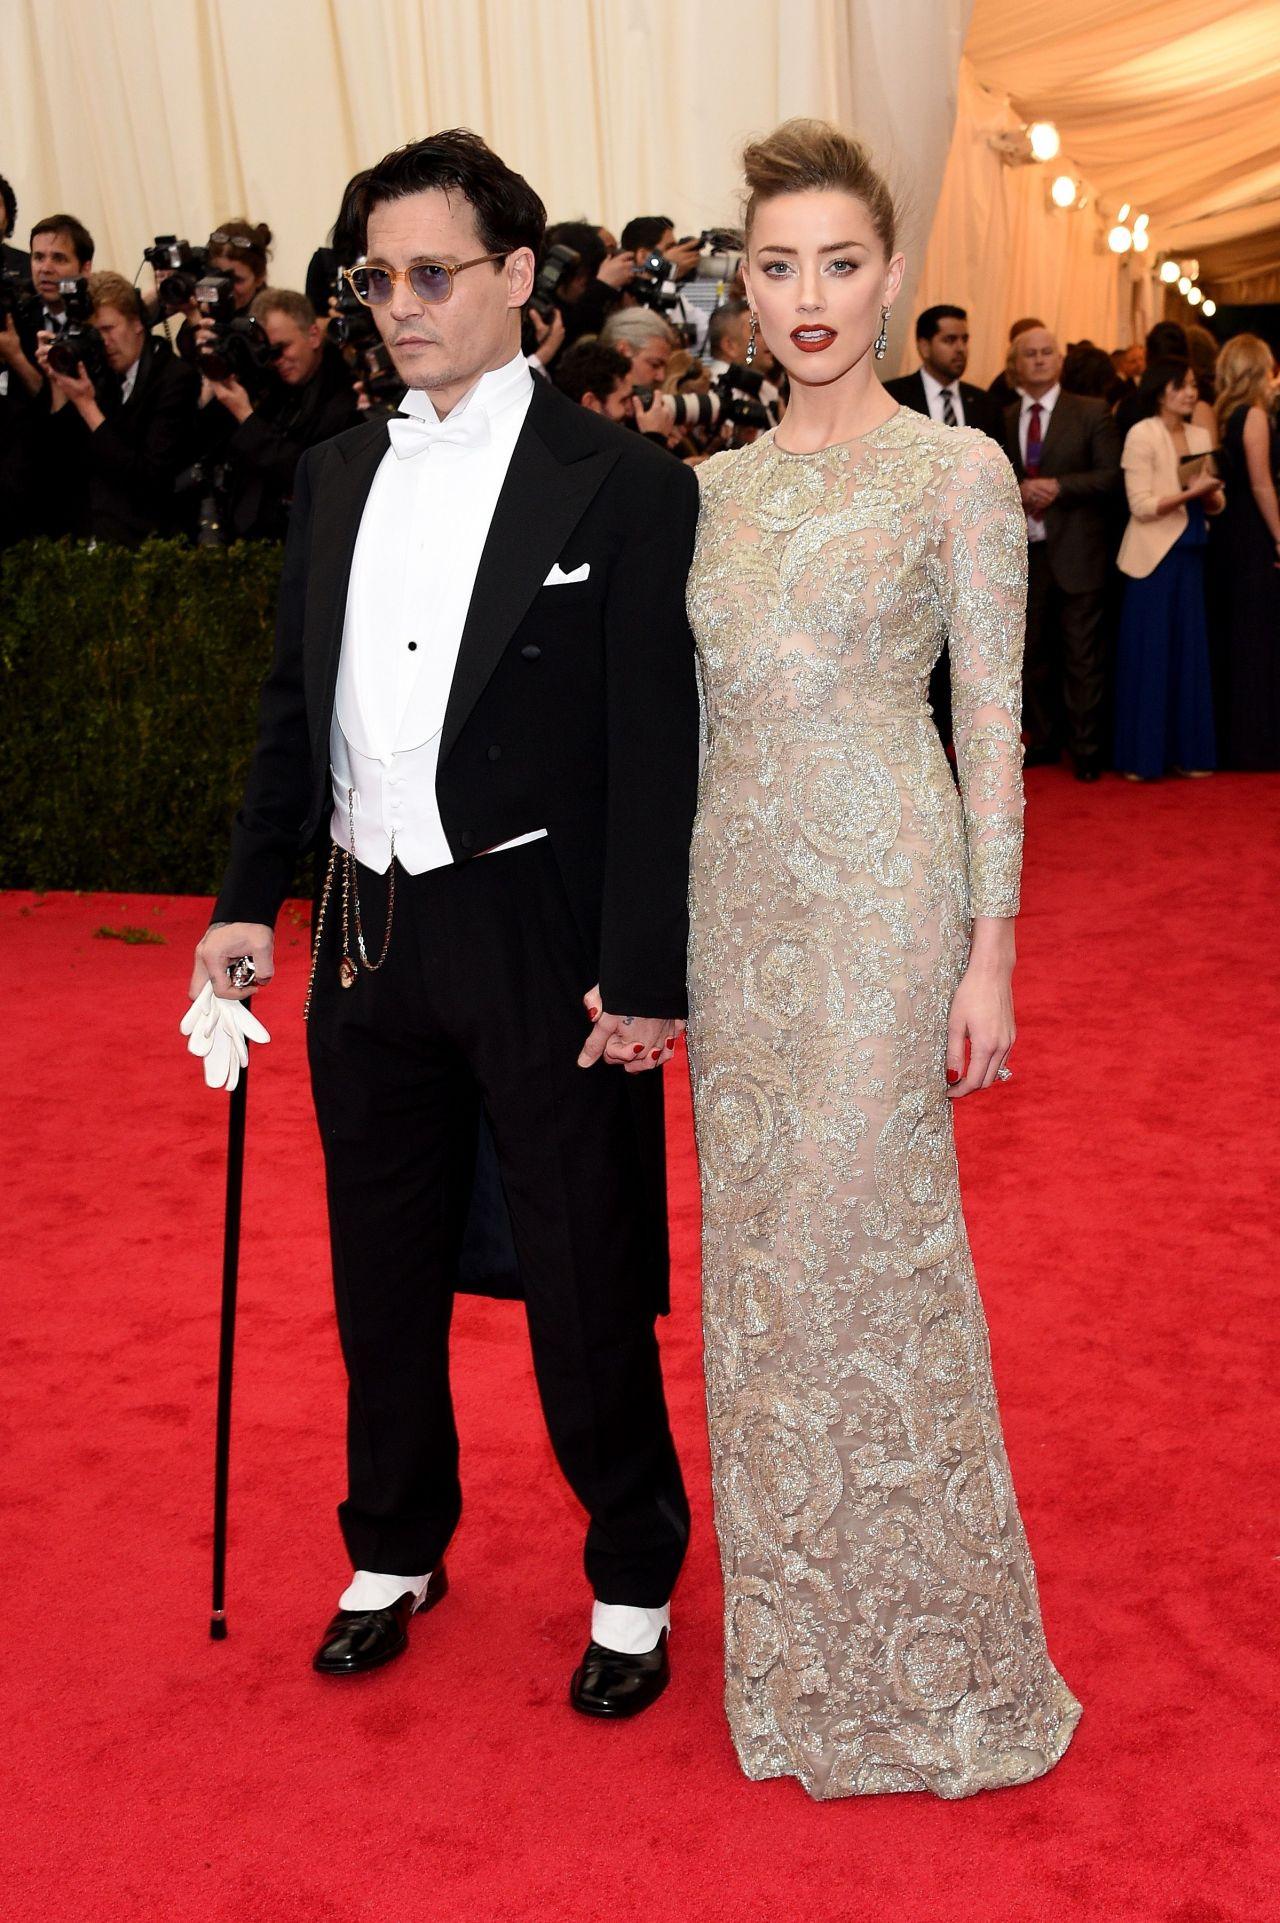 Amber Heard and Johnny Depp     2014 Met Costume Institute GalaJohnny Depp Amber Heard 2014